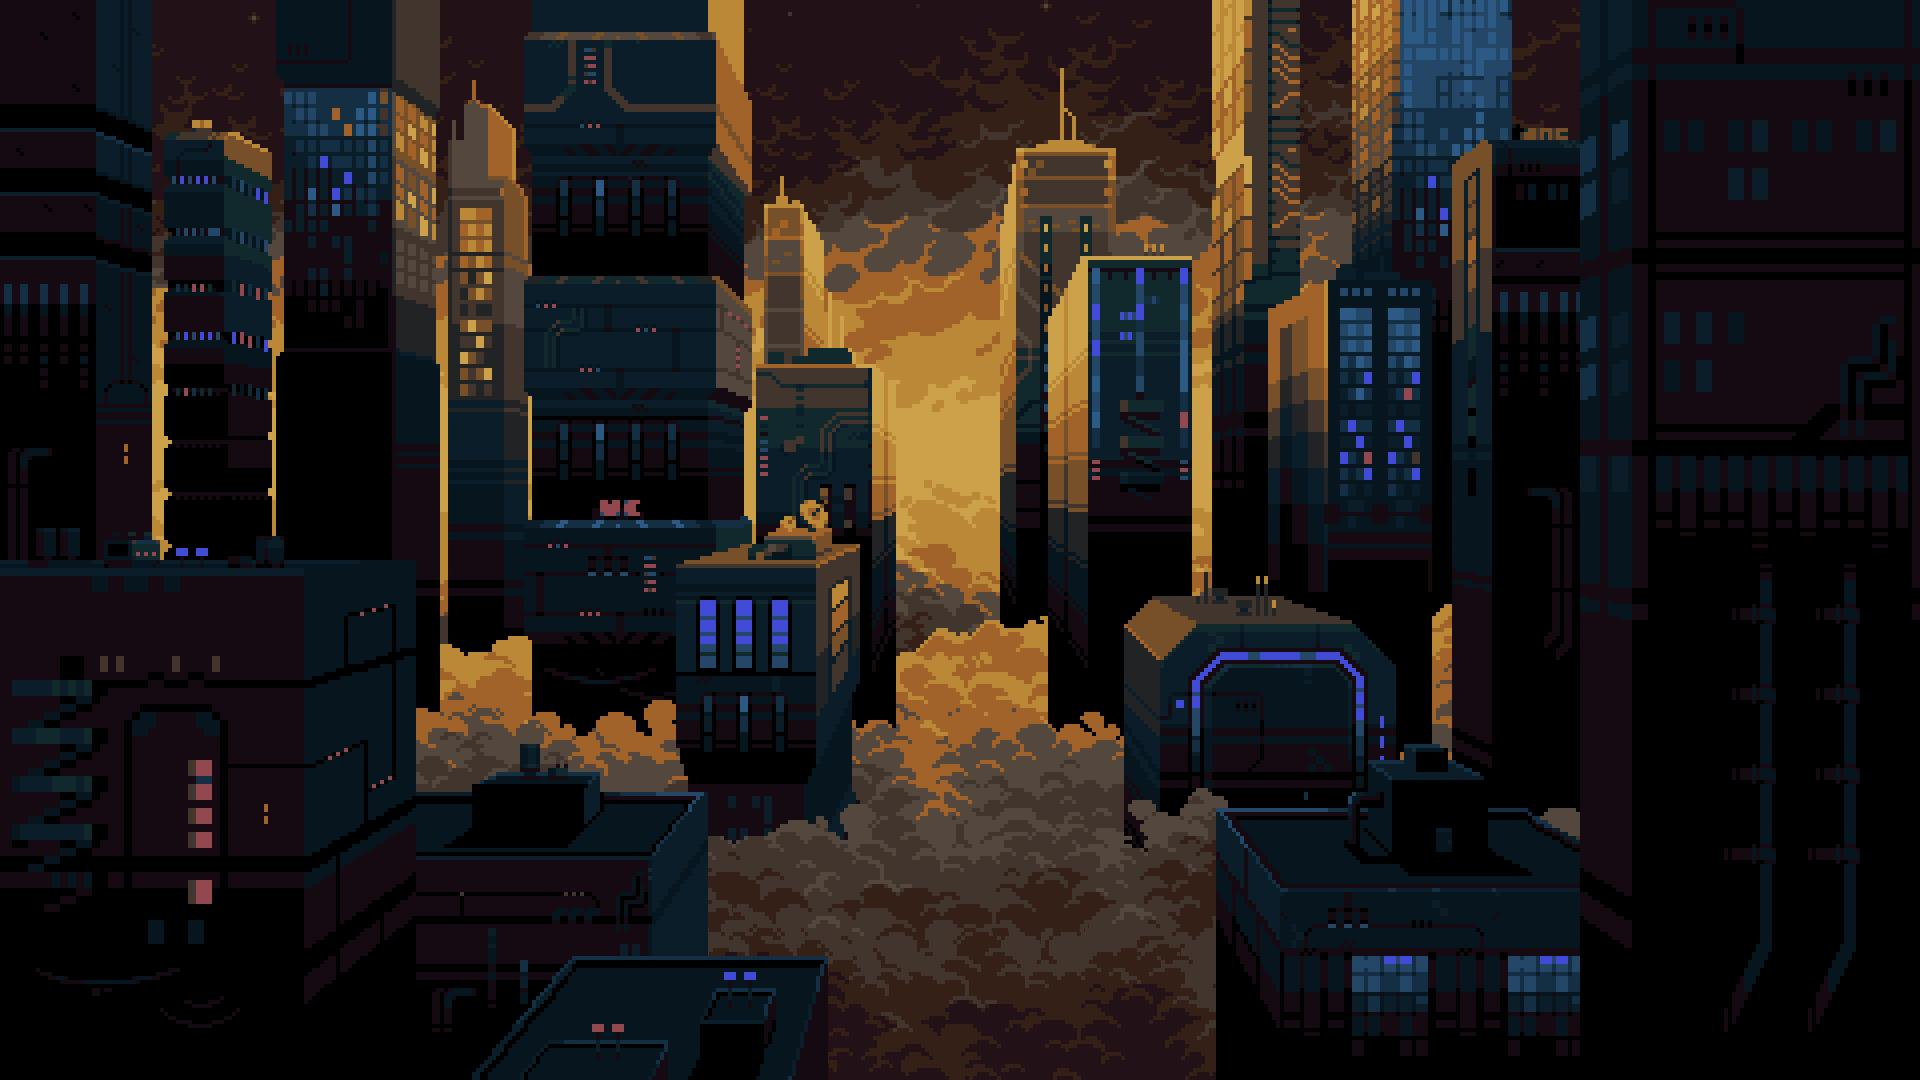 Dystopian NYC 2048